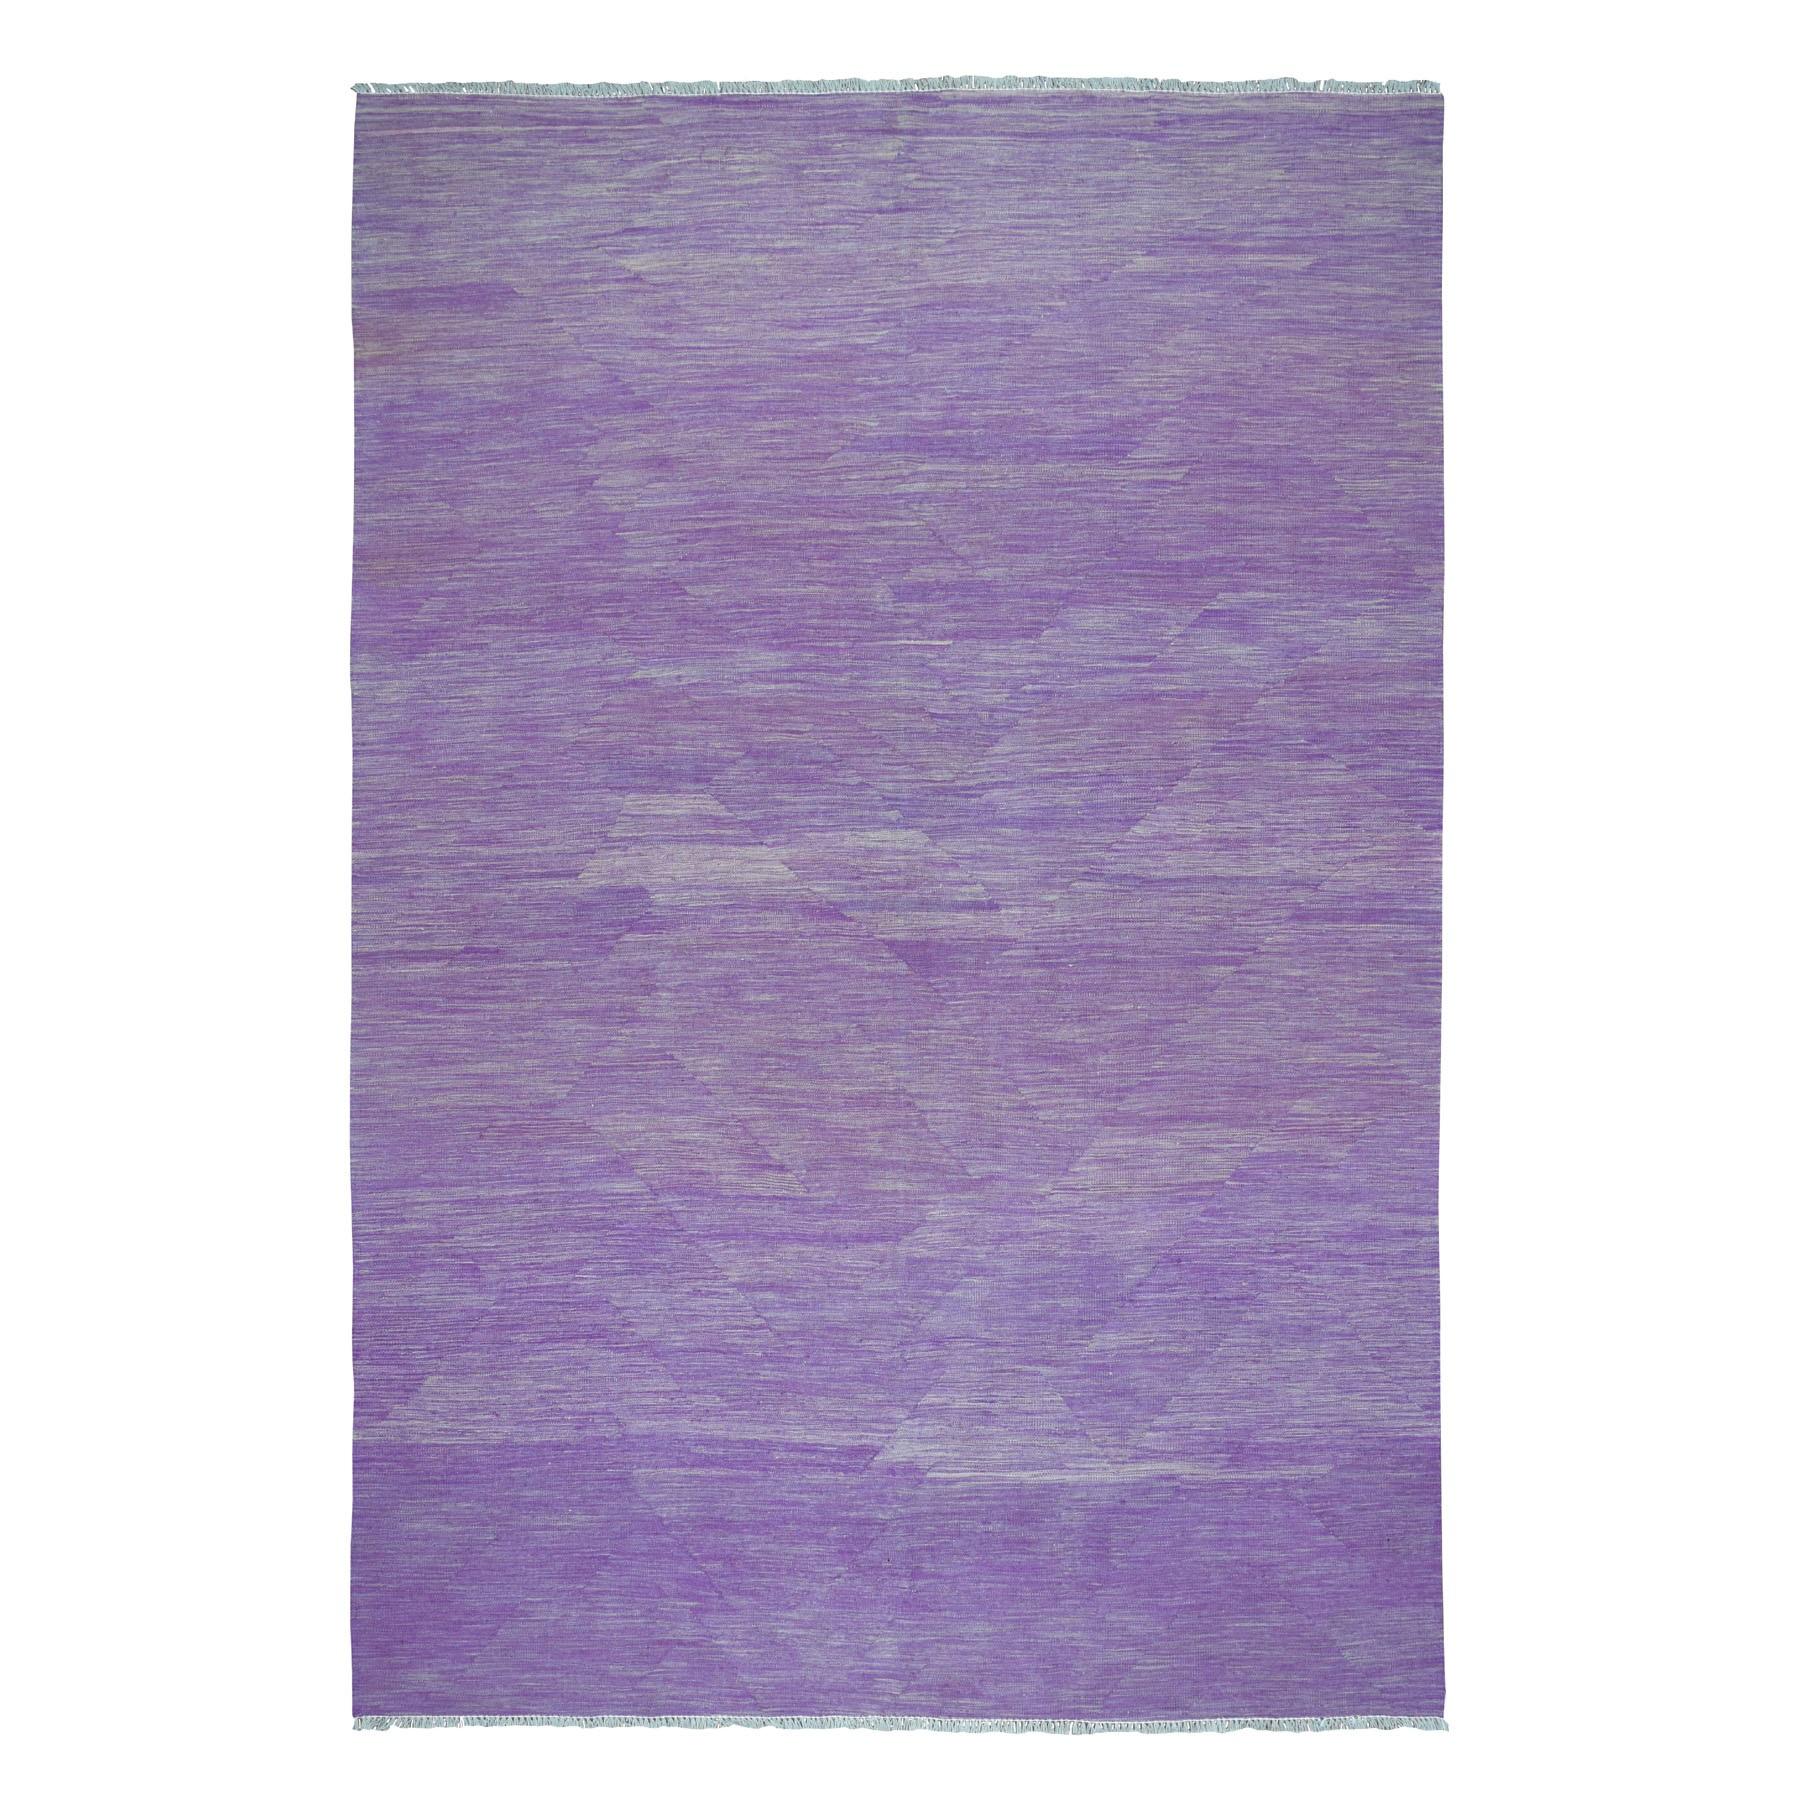 Fine Kilim Collection Hand Woven Purple Rug No: 01108426